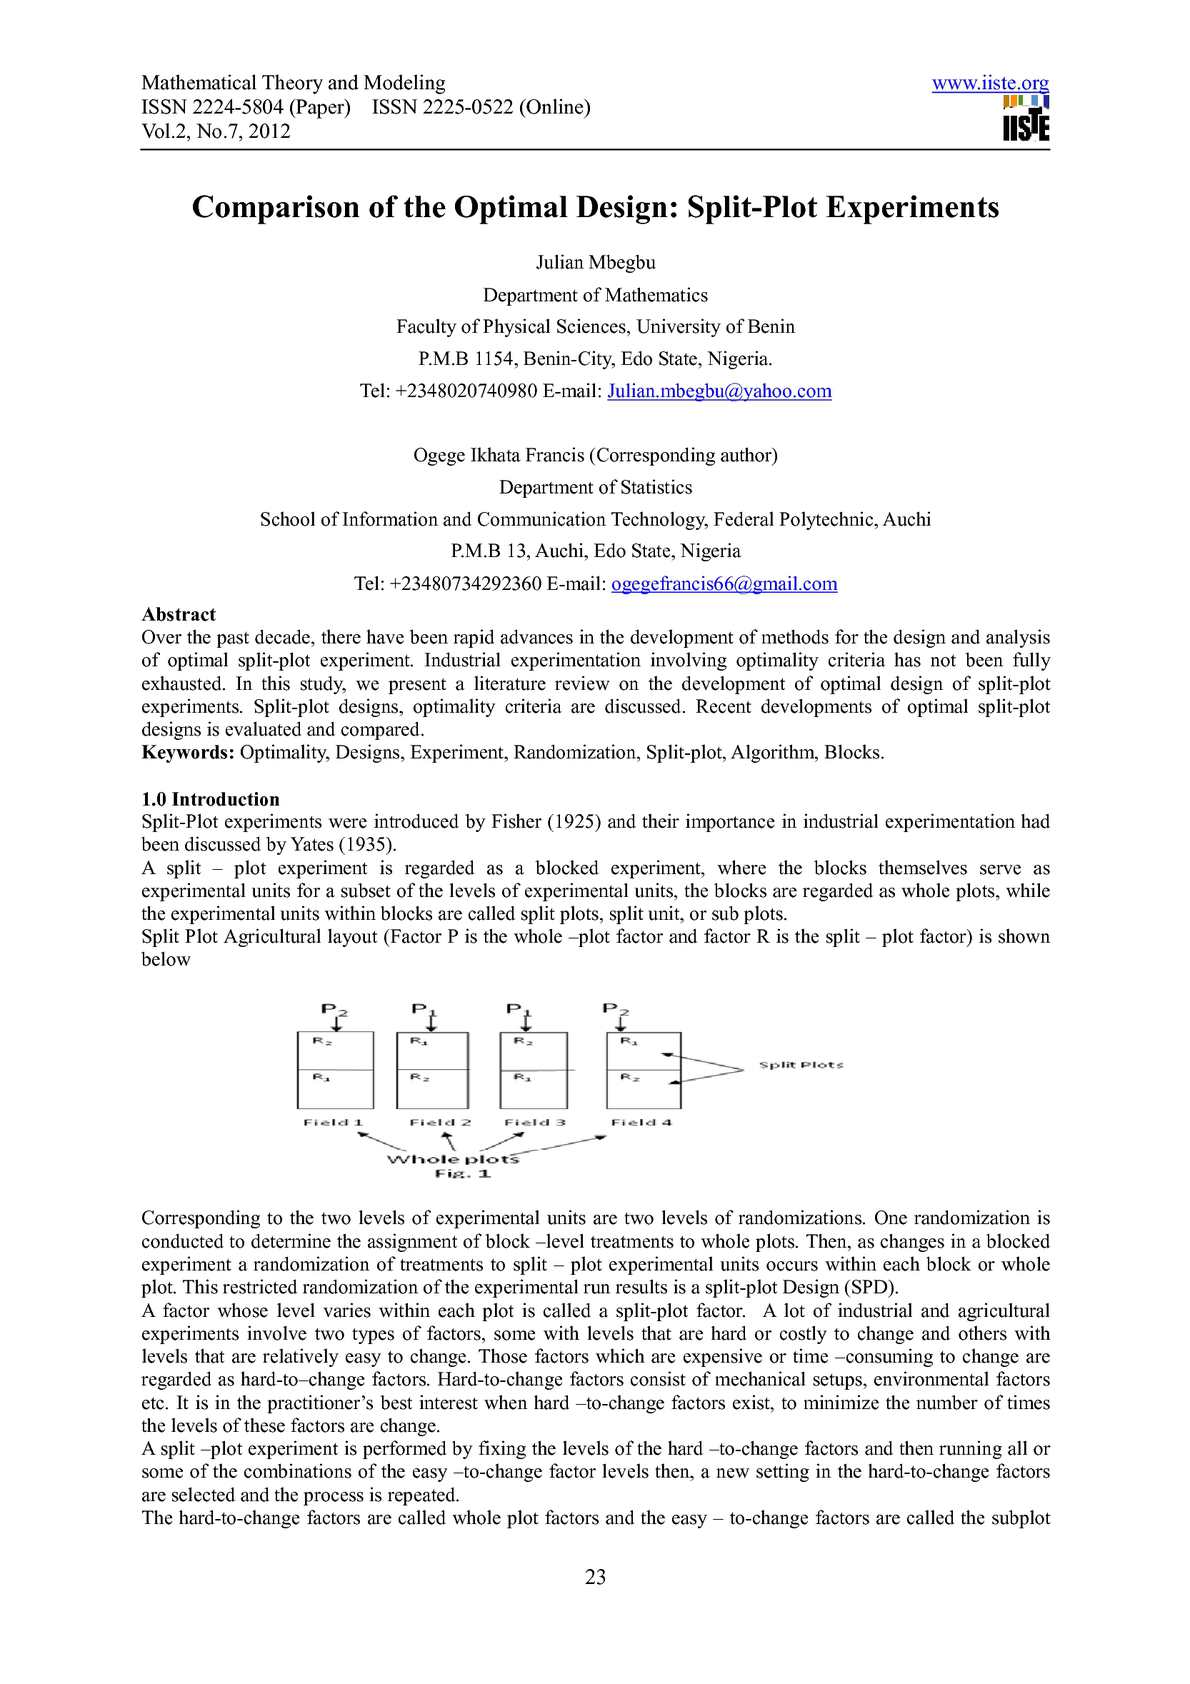 Calaméo - Comparison of the Optimal Design